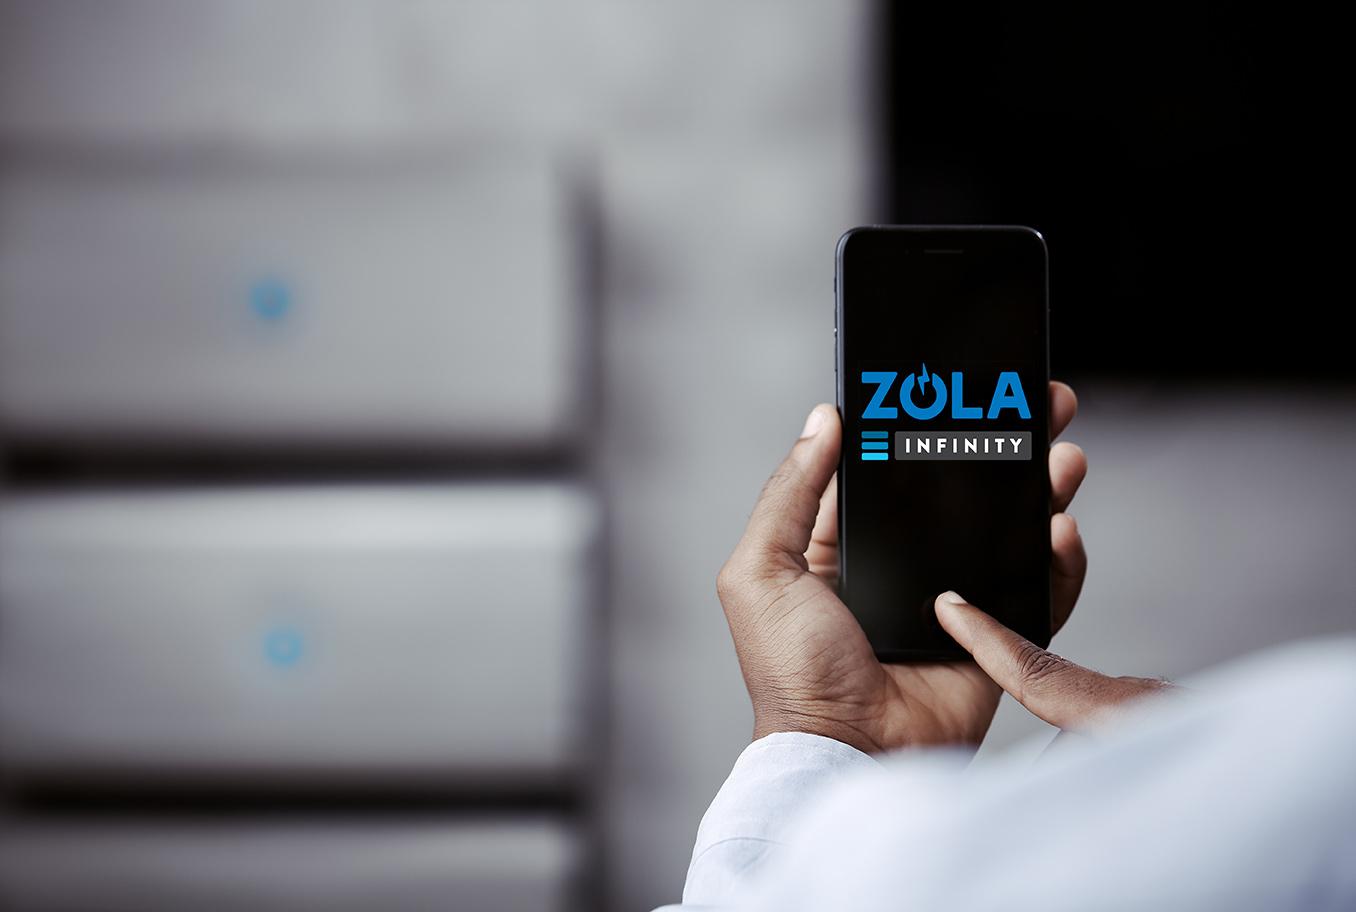 ZOLA-Electric-INFINITY-Africa-Nigeria-Lagos-Urban-Cutomer-using-App_KST1037.jpg